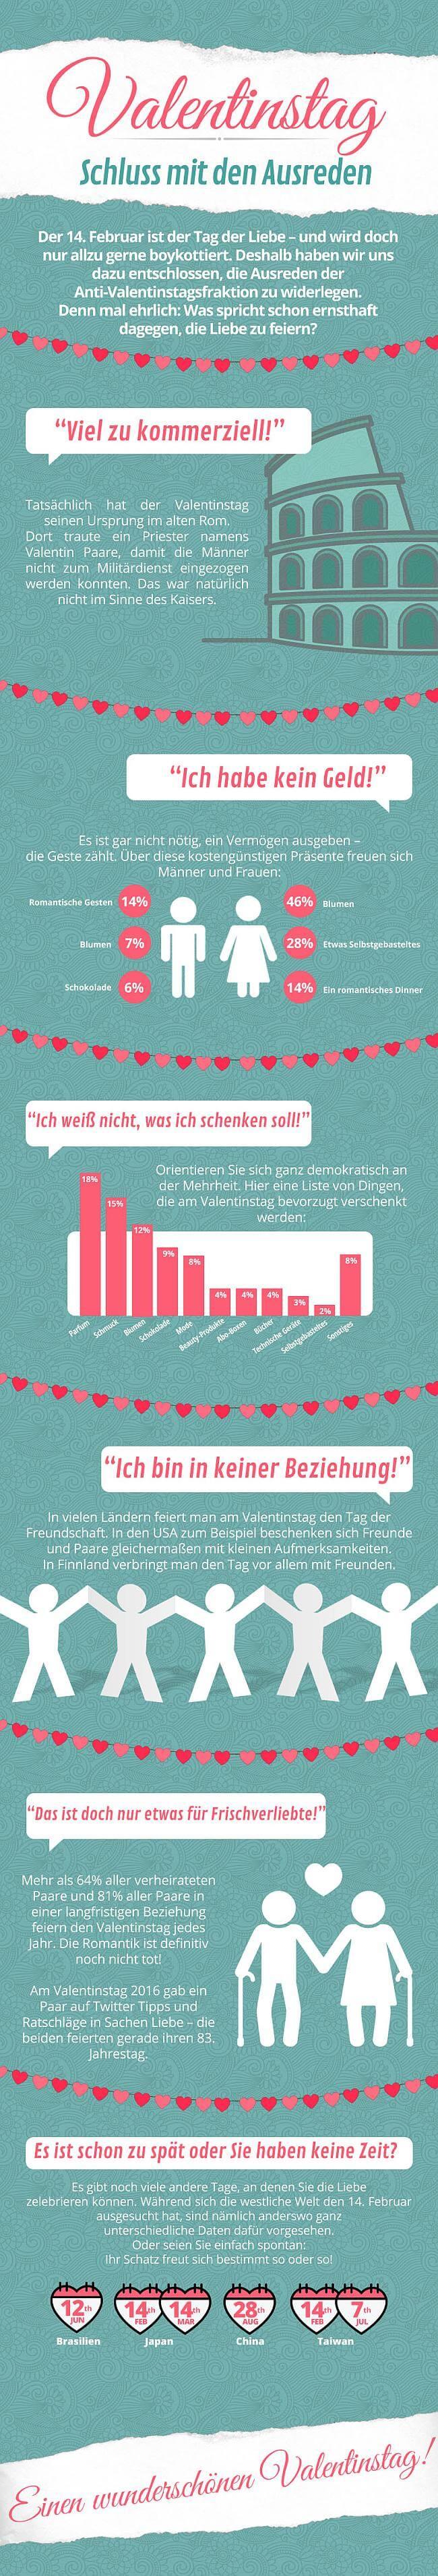 Valentinstag_Grafik_internetblogger-de